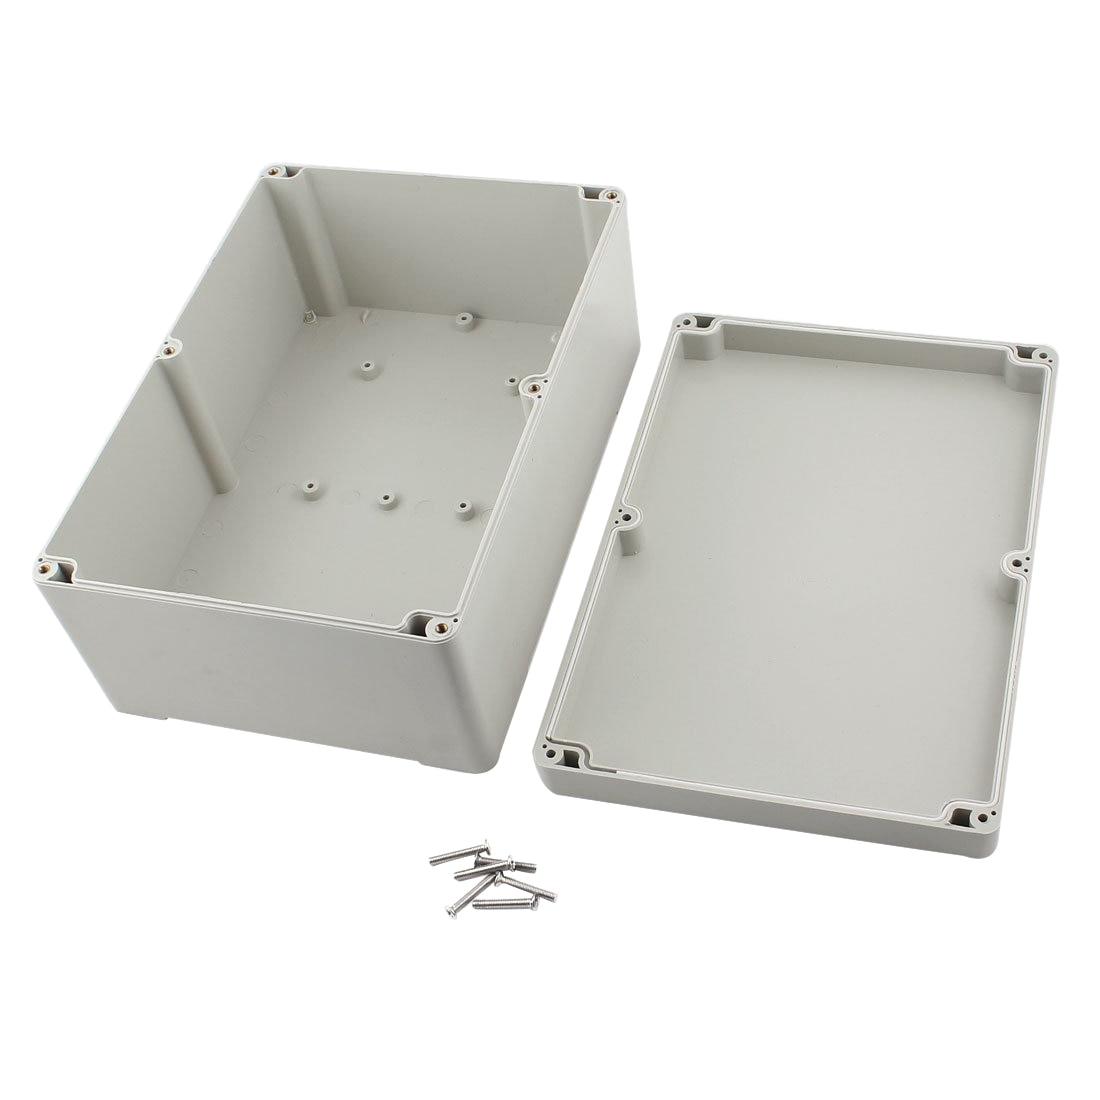 JFBL Hot Waterproof Plastic Enclosure Case Junction Box 265mm x 185mm x 115mm